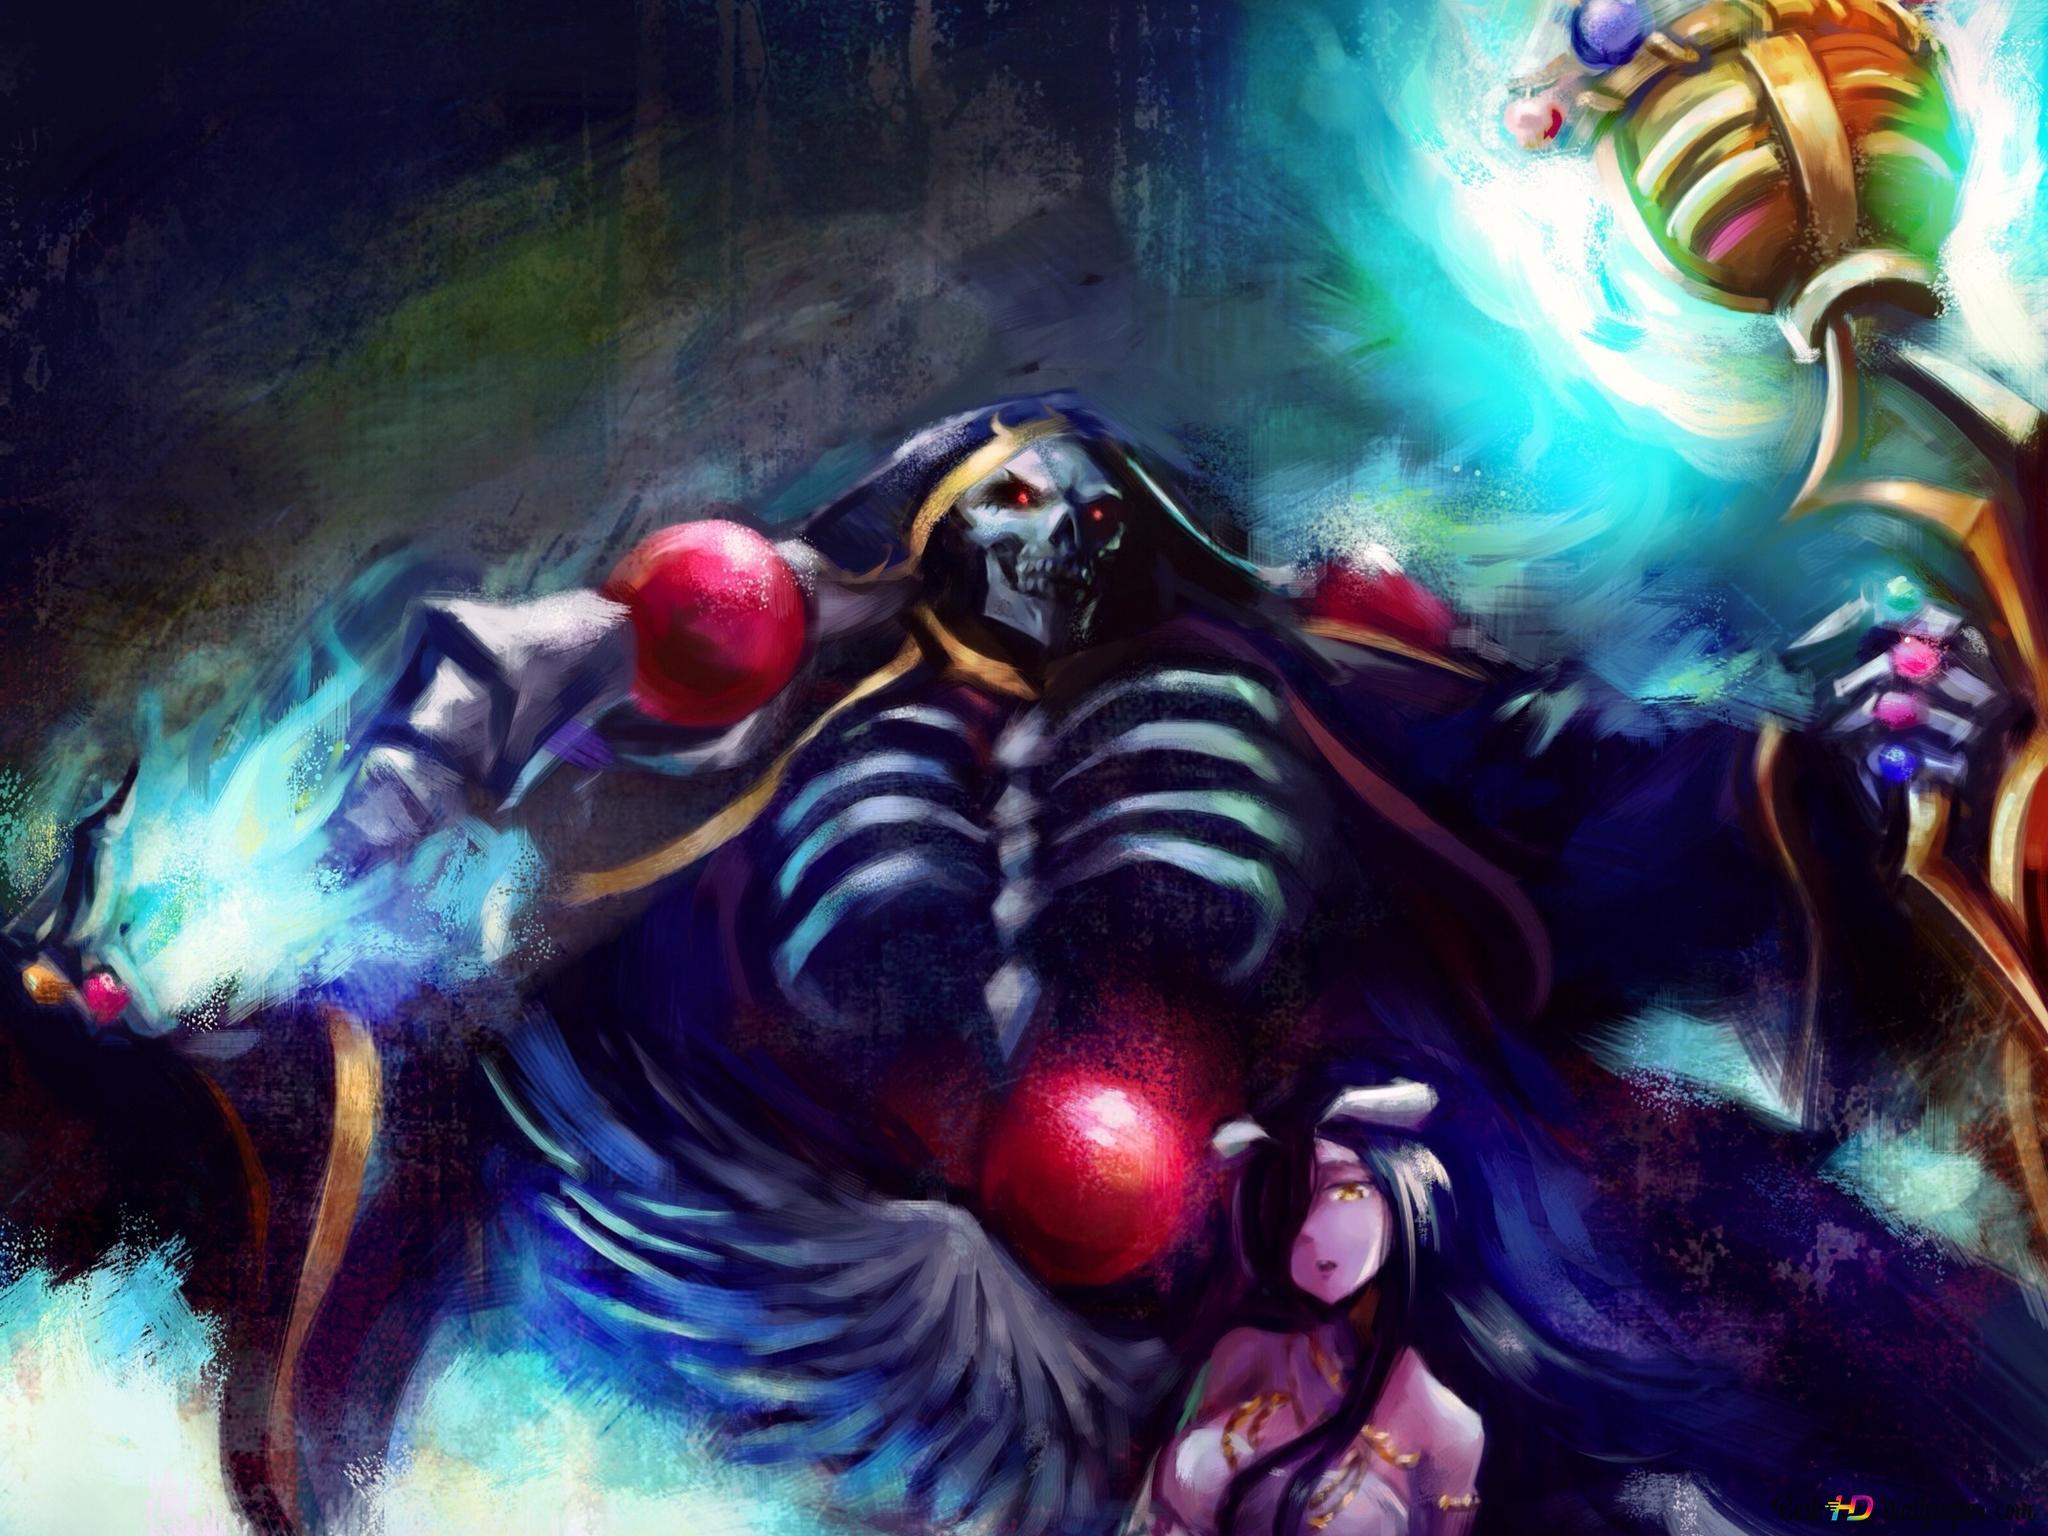 Overlord Ainz Ooal Gown Eternal Legend Albedo Hd Wallpaper Download